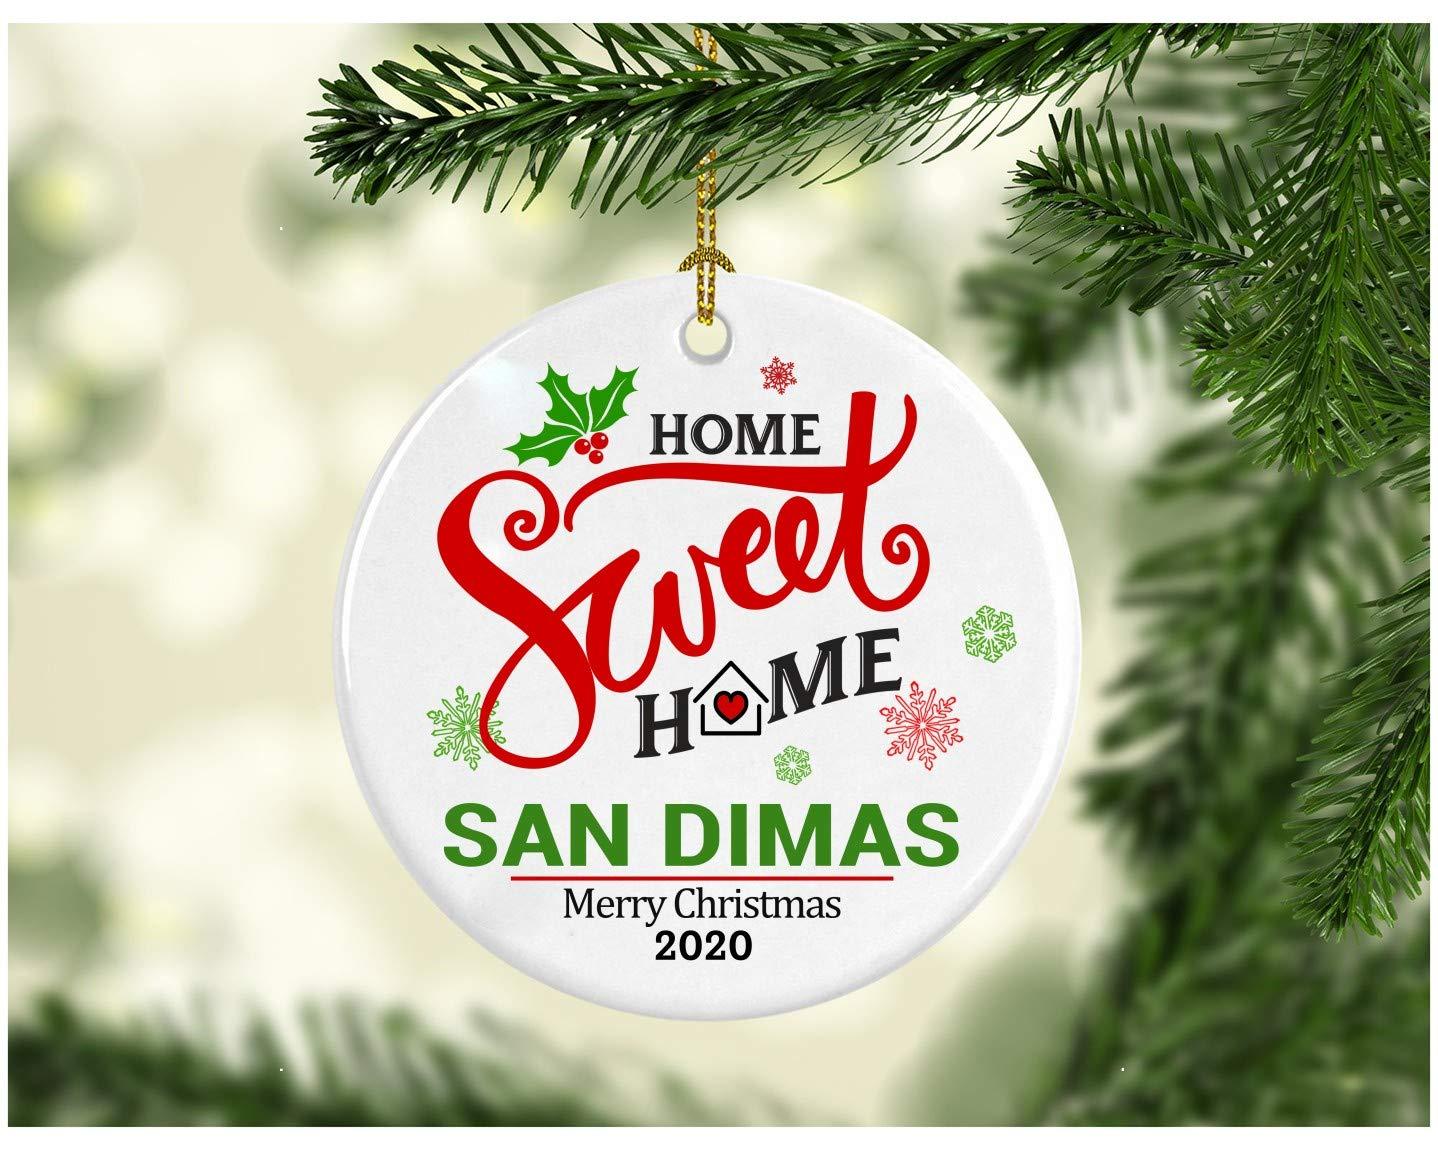 Xmas Christmas Ormament 2020 Wjit House Amazon.com: Christmas Decoration Tree Ornament State   Home Sweet